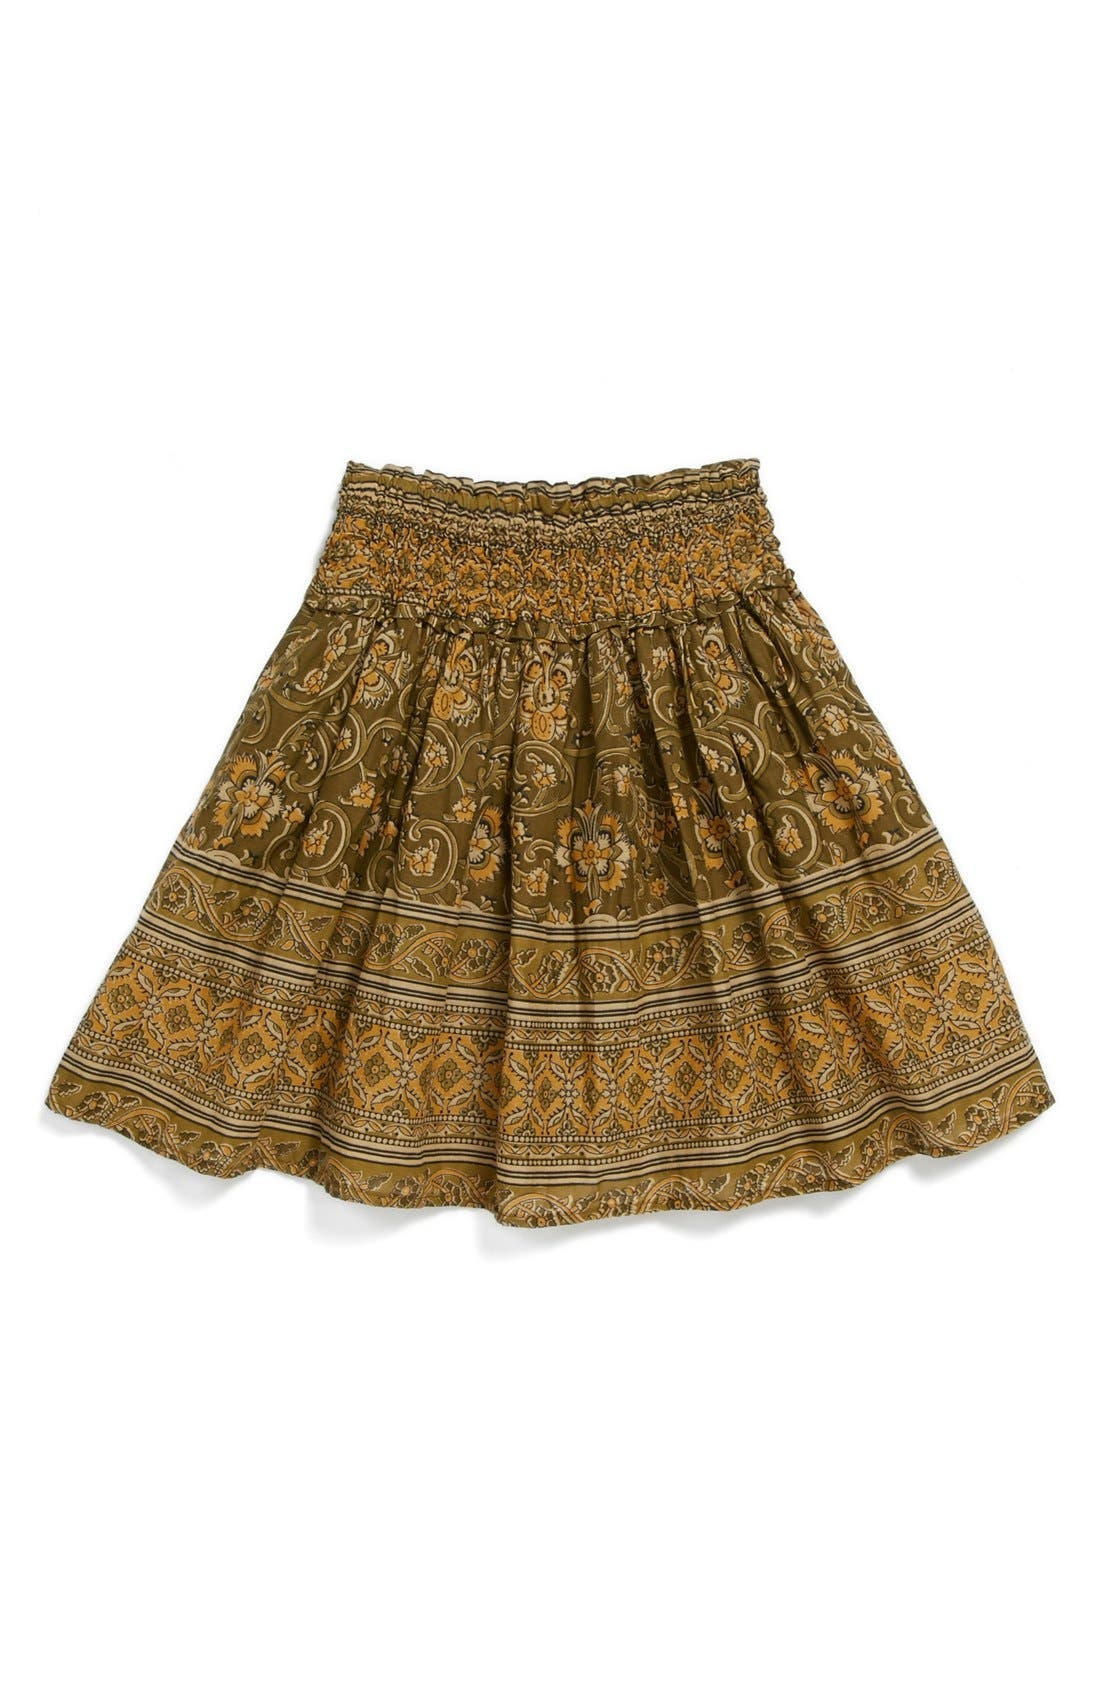 Alternate Image 1 Selected - Peek 'Esperanza' Skirt (Toddler, Little Girls & Big Girls)